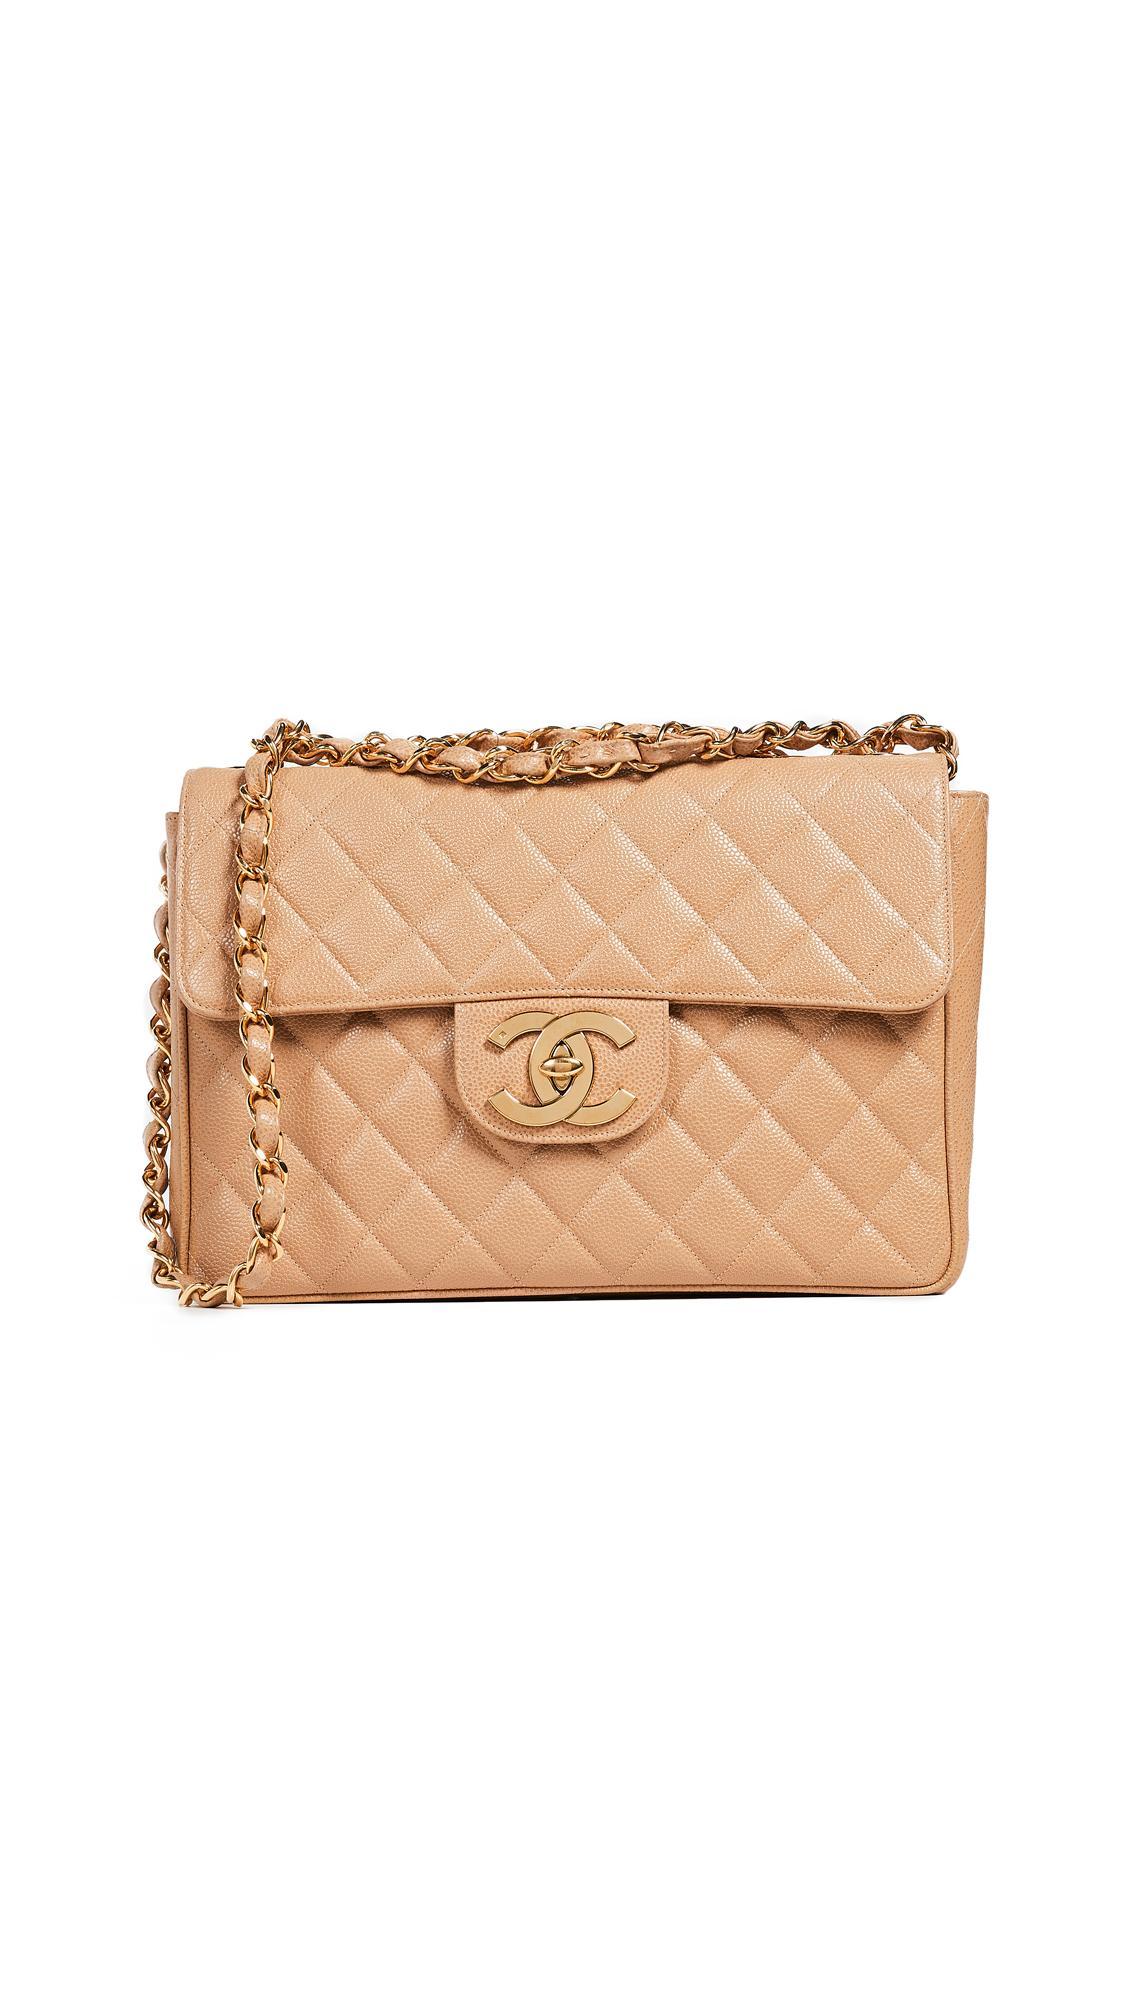 6156364b15cd What Goes Around Comes Around Chanel Caviar Half Flap Jumbo Bag In Beige